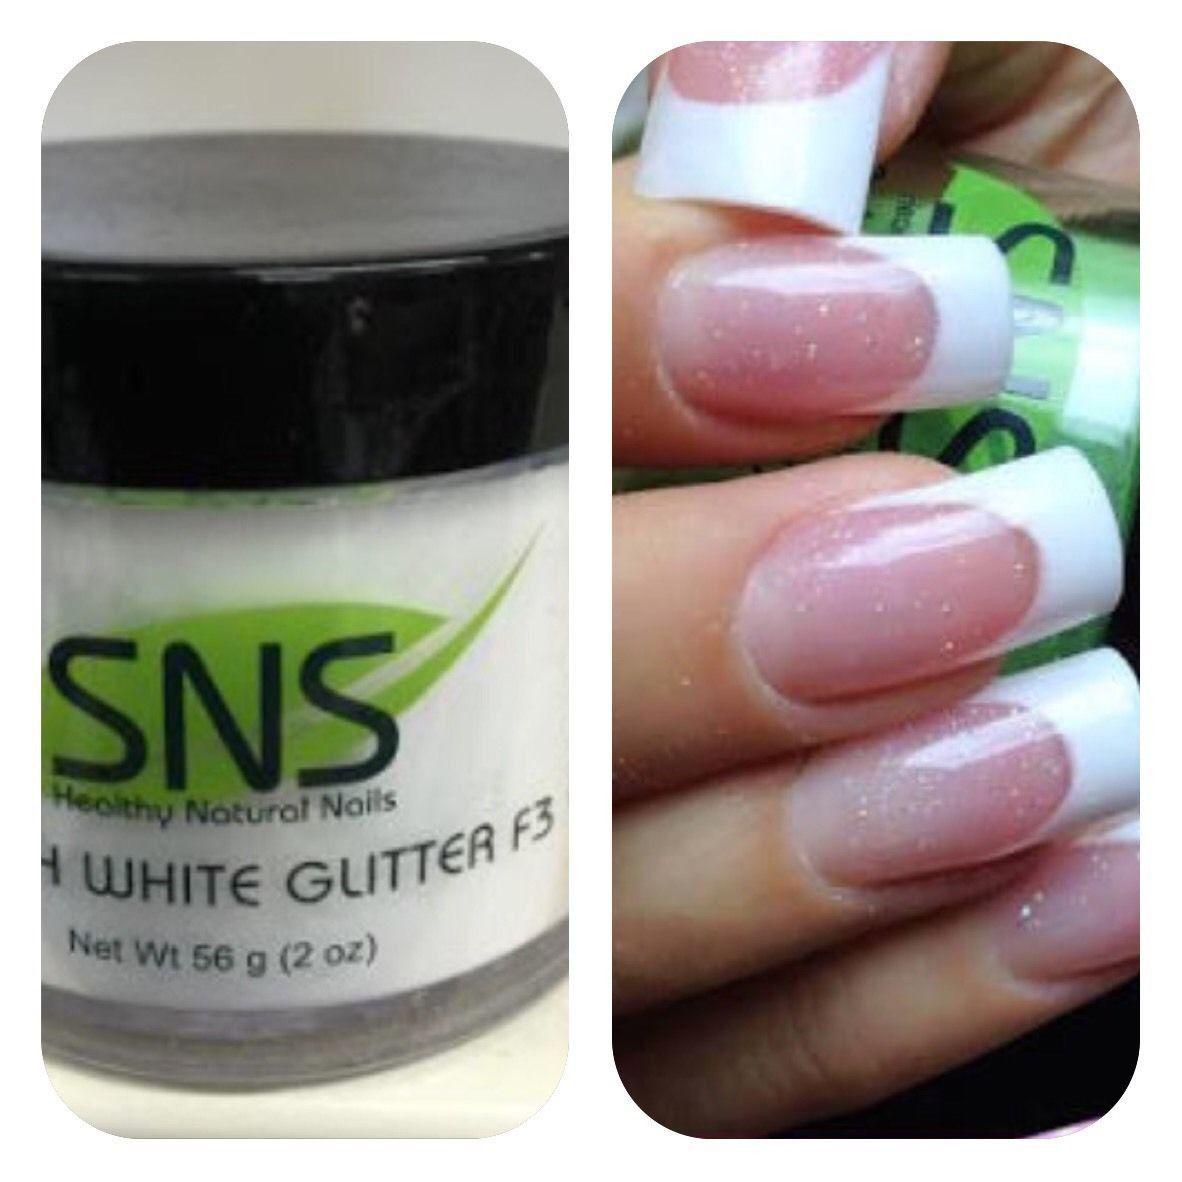 Sns French White Glitter F3 Signature Nail System Dipping Powder 2oz Sns Nails Colors Sns Nails Designs Sns Nail Powder